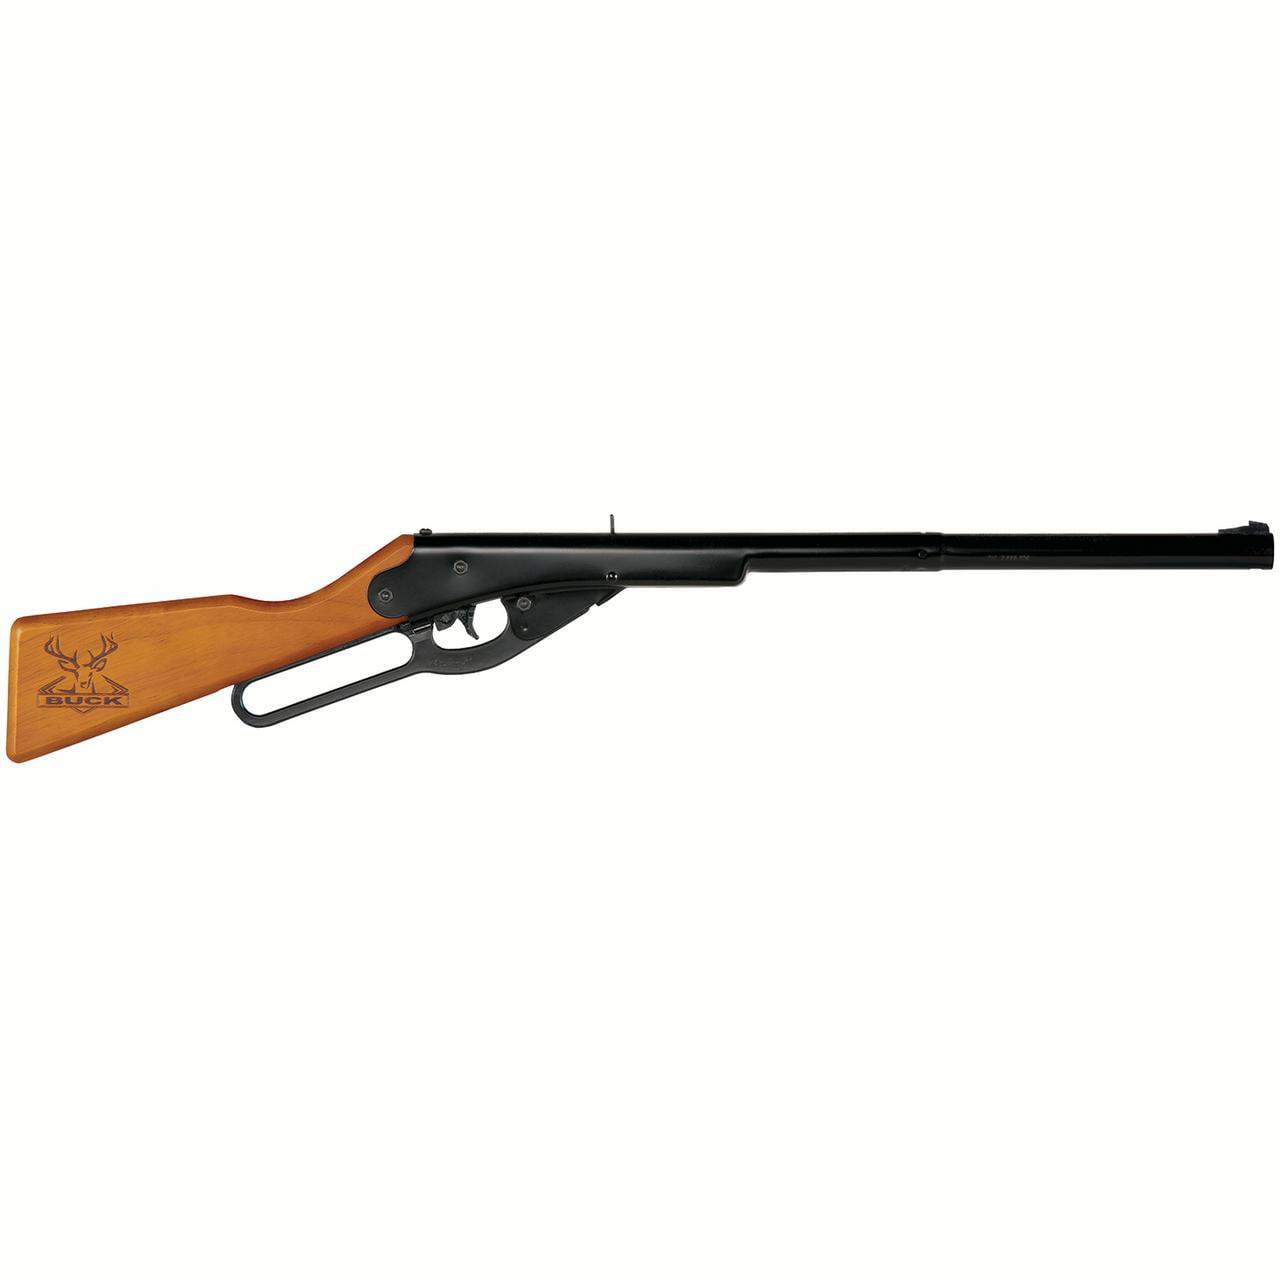 Ccebccfdaceddedeaaaddcfeddjpeg - Rental invoice template microsoft word best online gun store